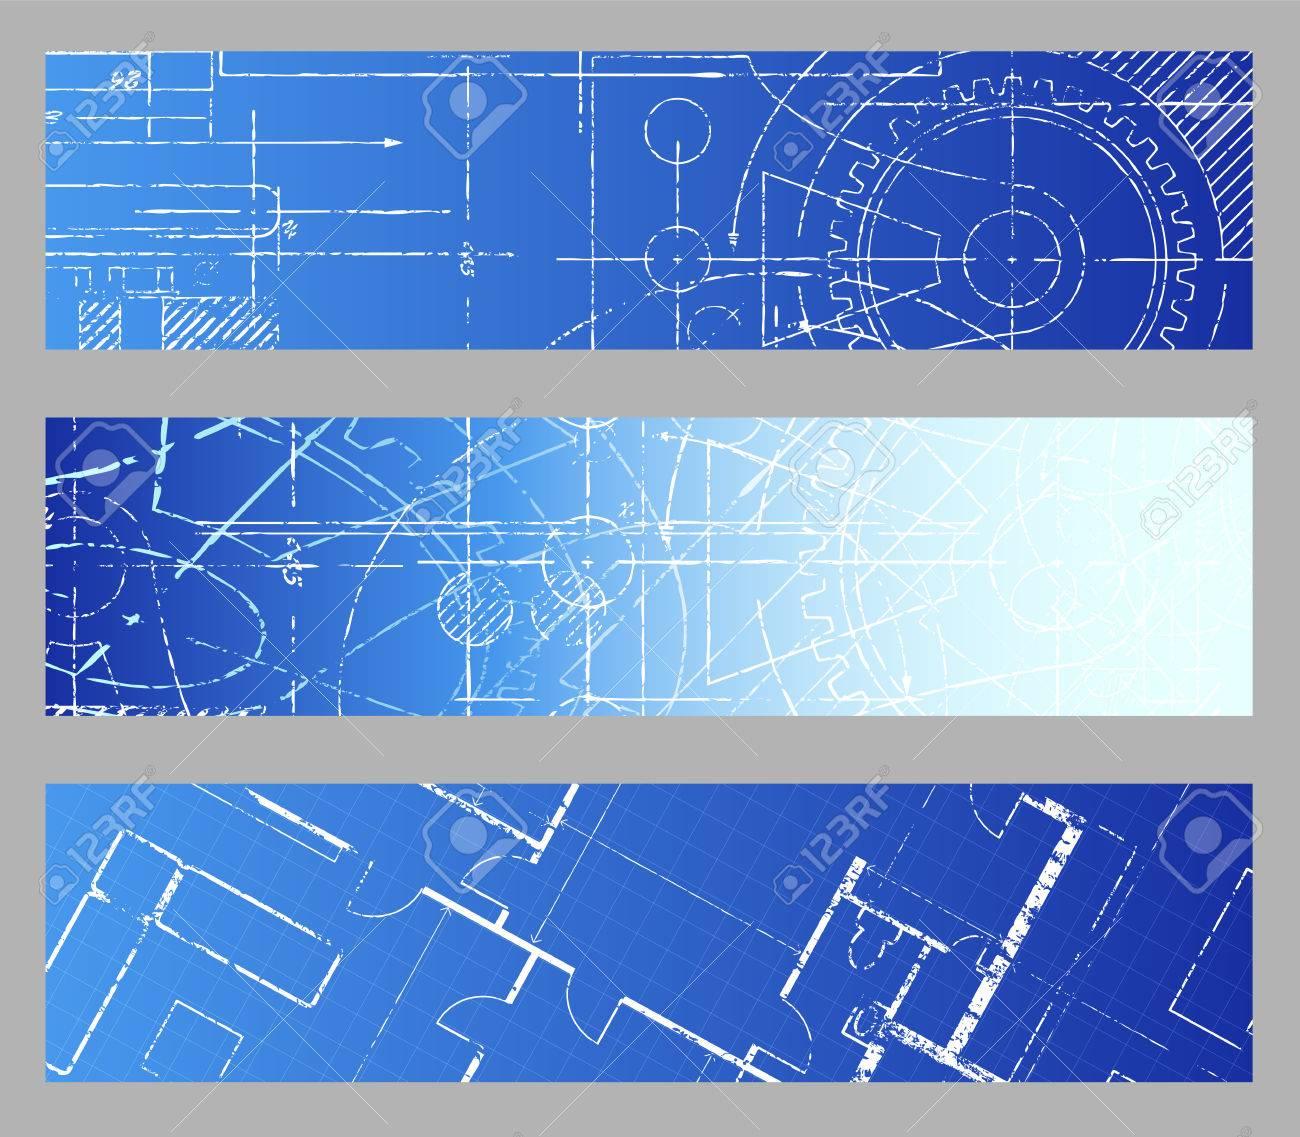 Technical blueprint engineering web banner vector backgrounds technical blueprint engineering web banner vector backgrounds stock vector 37238585 malvernweather Choice Image